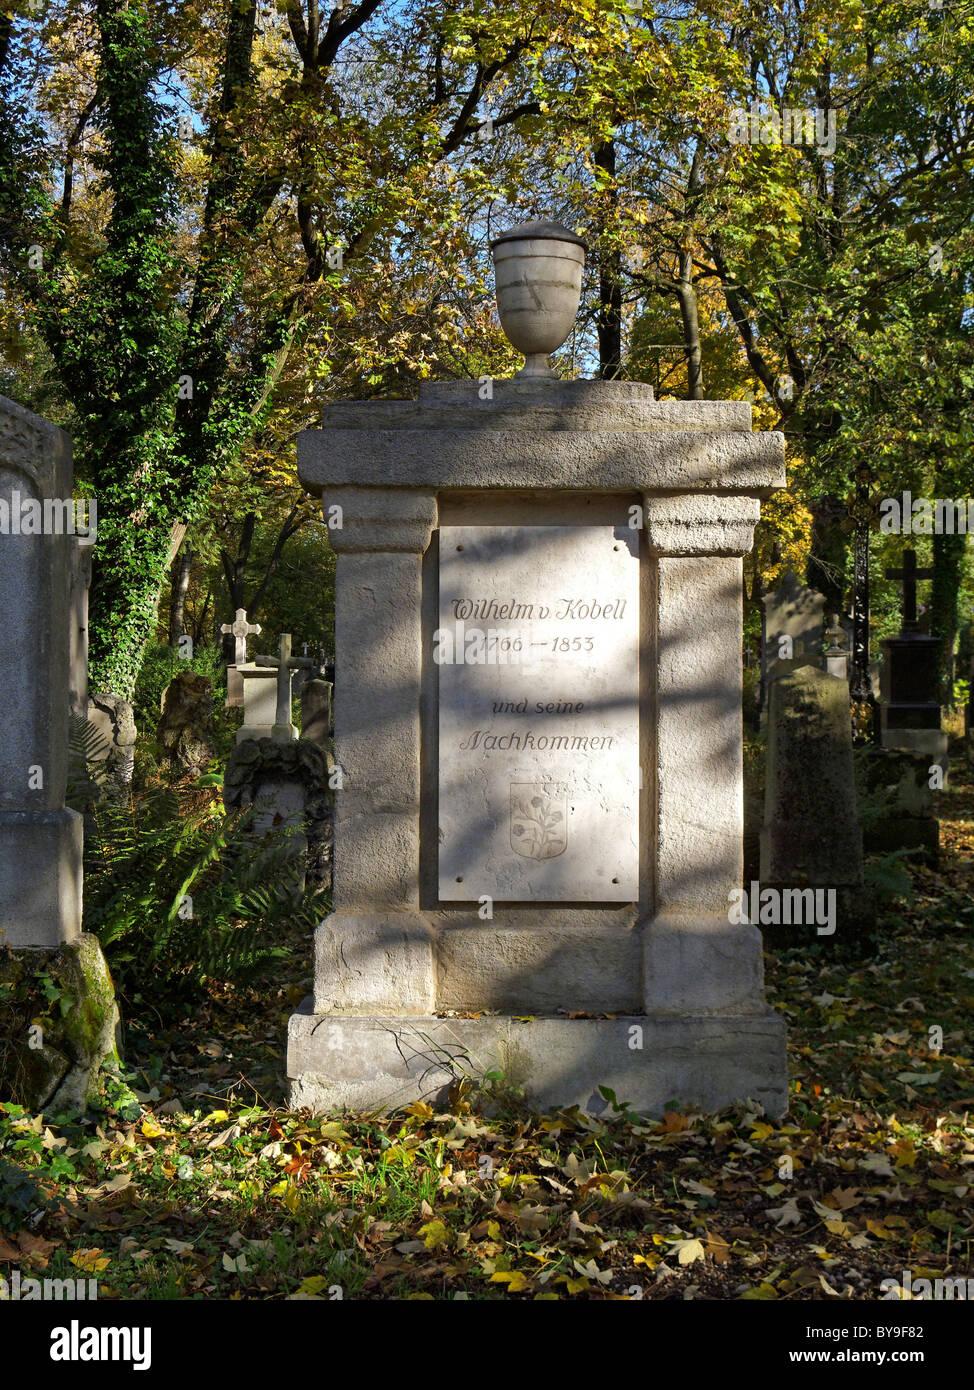 Grave of Wilhelm von Kobell, 1766-1853, painter, Southern Cemetery Munich, Upper Bavaria, Bavaria, Germany, Europe - Stock Image